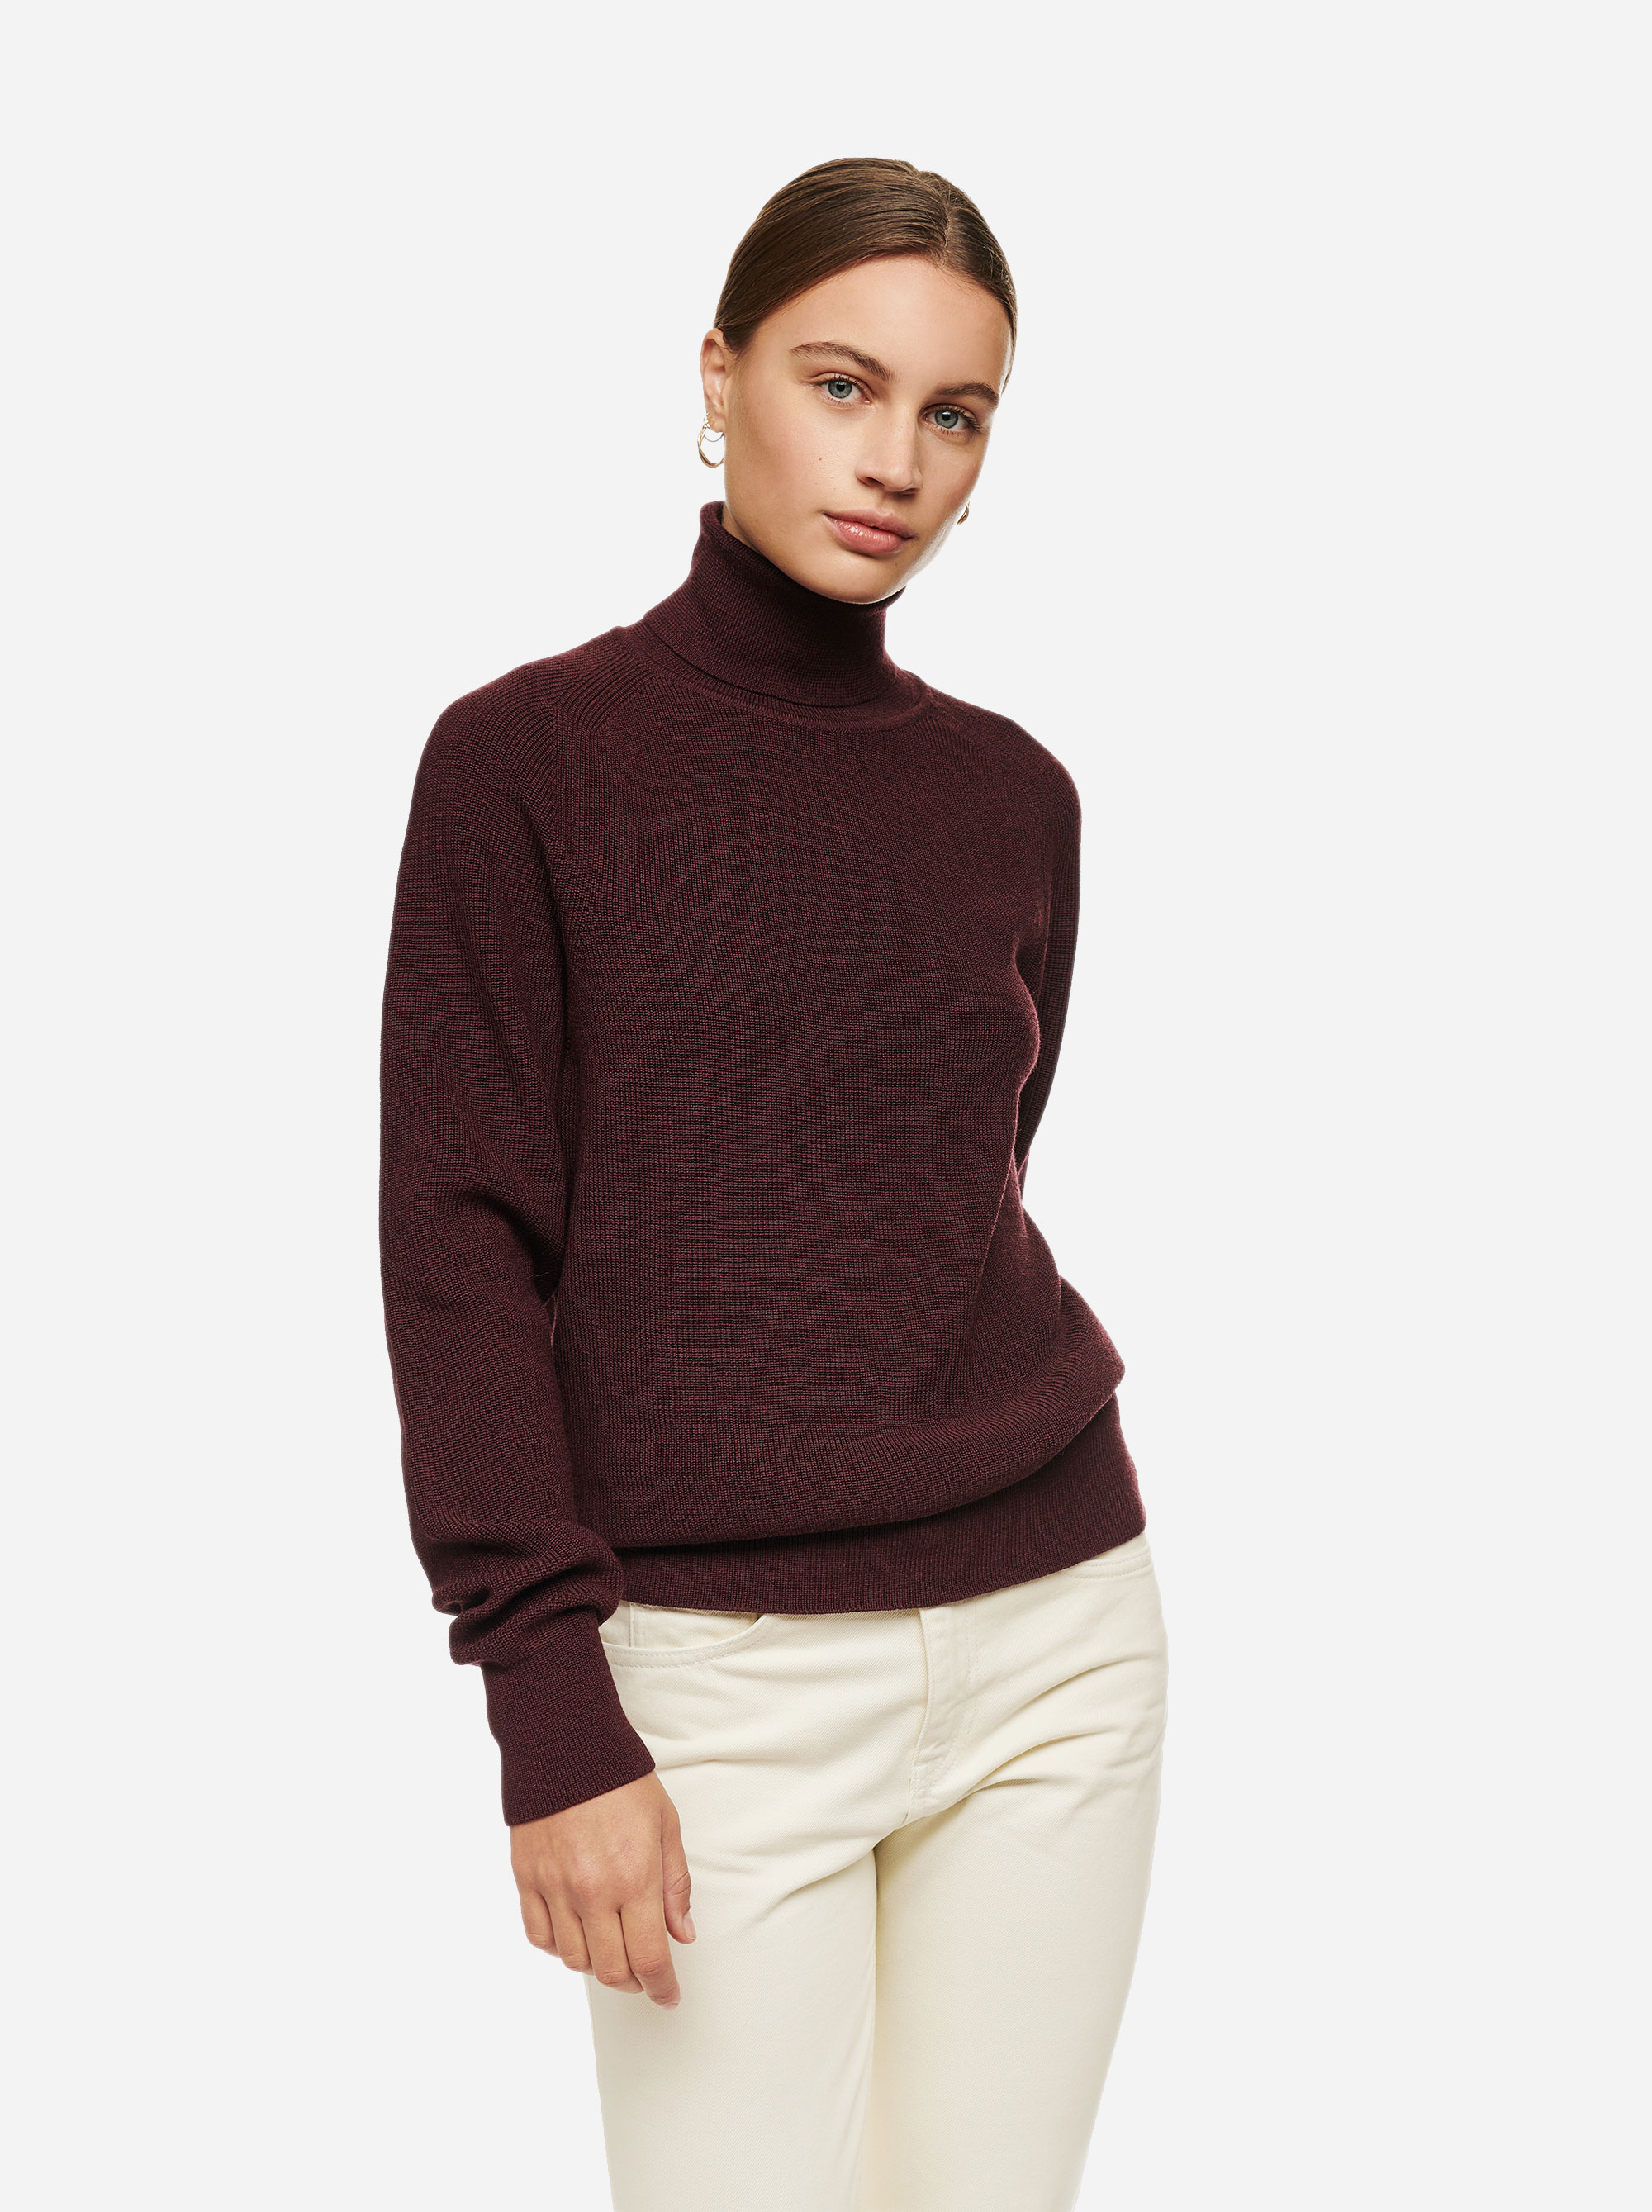 Teym - Turtleneck - The Merino Sweater - Men - Burgundy - 1